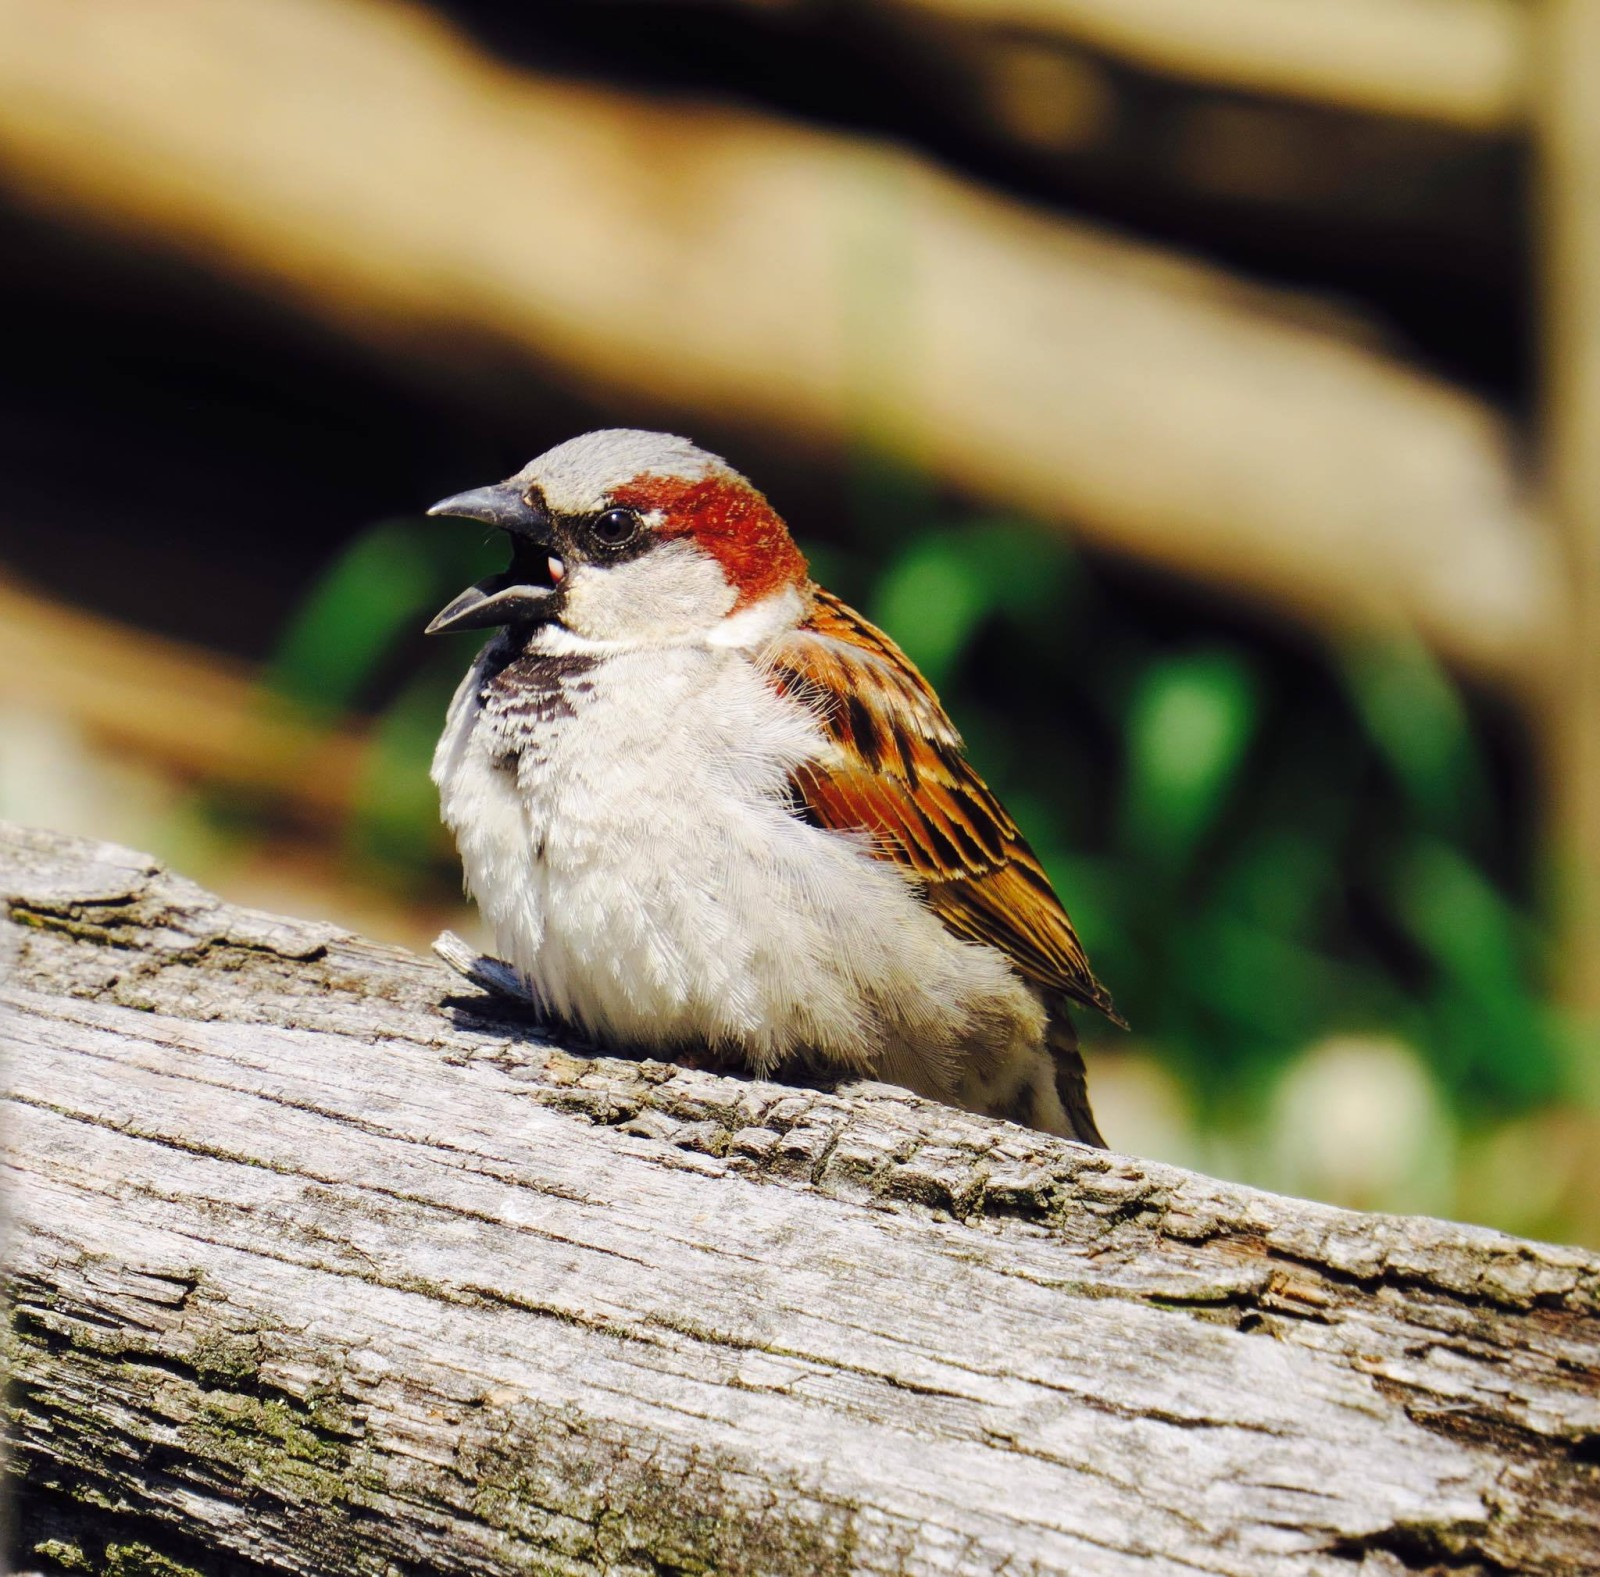 From: Tia Johns-Barcenas House sparrow, taken at Booker T. Washington National Monument. 4-11-16